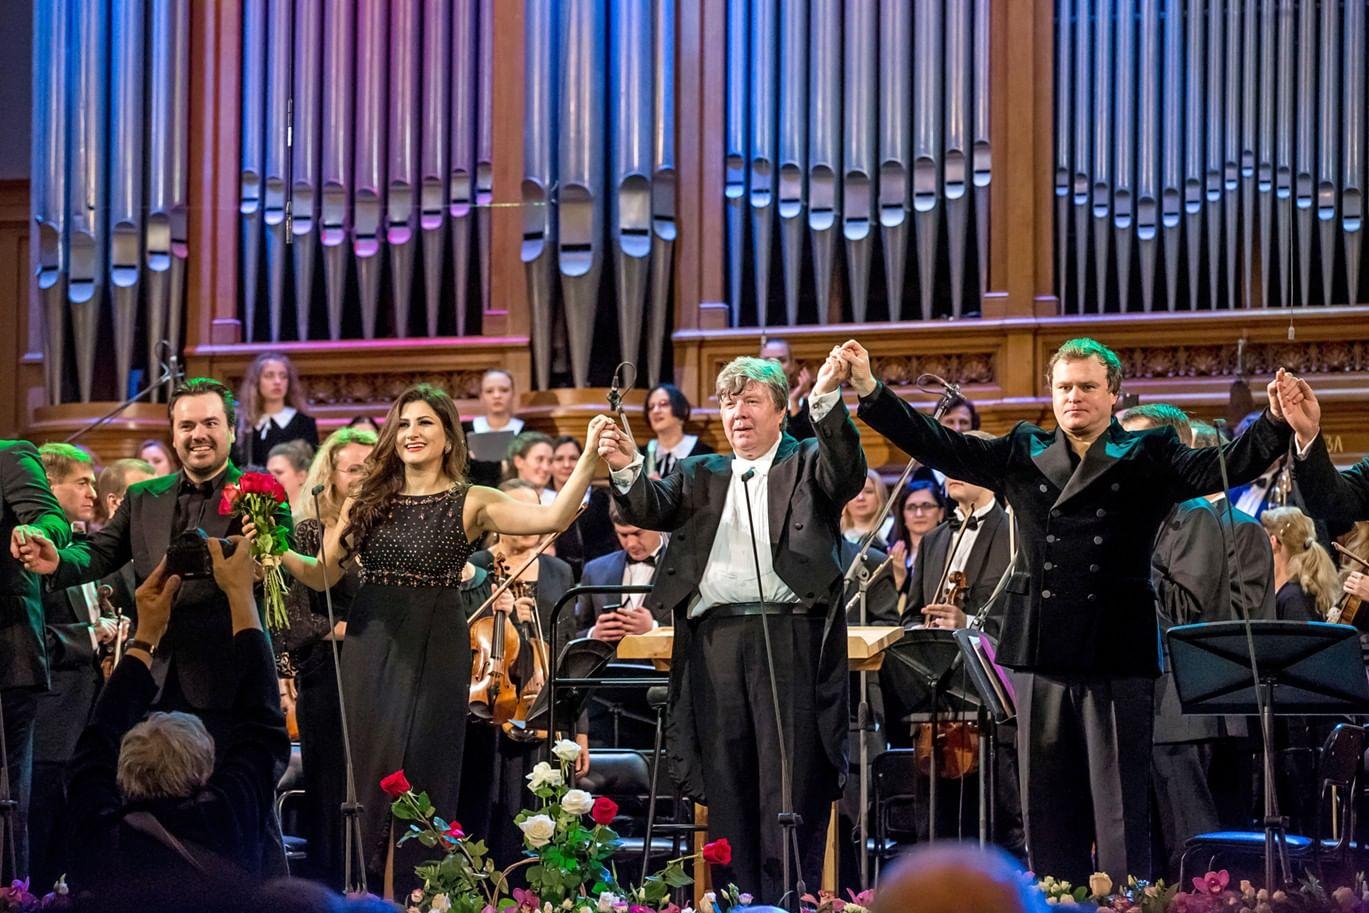 Андрей Петренко: «Я люблю хорошую музыку…». Галерея 1